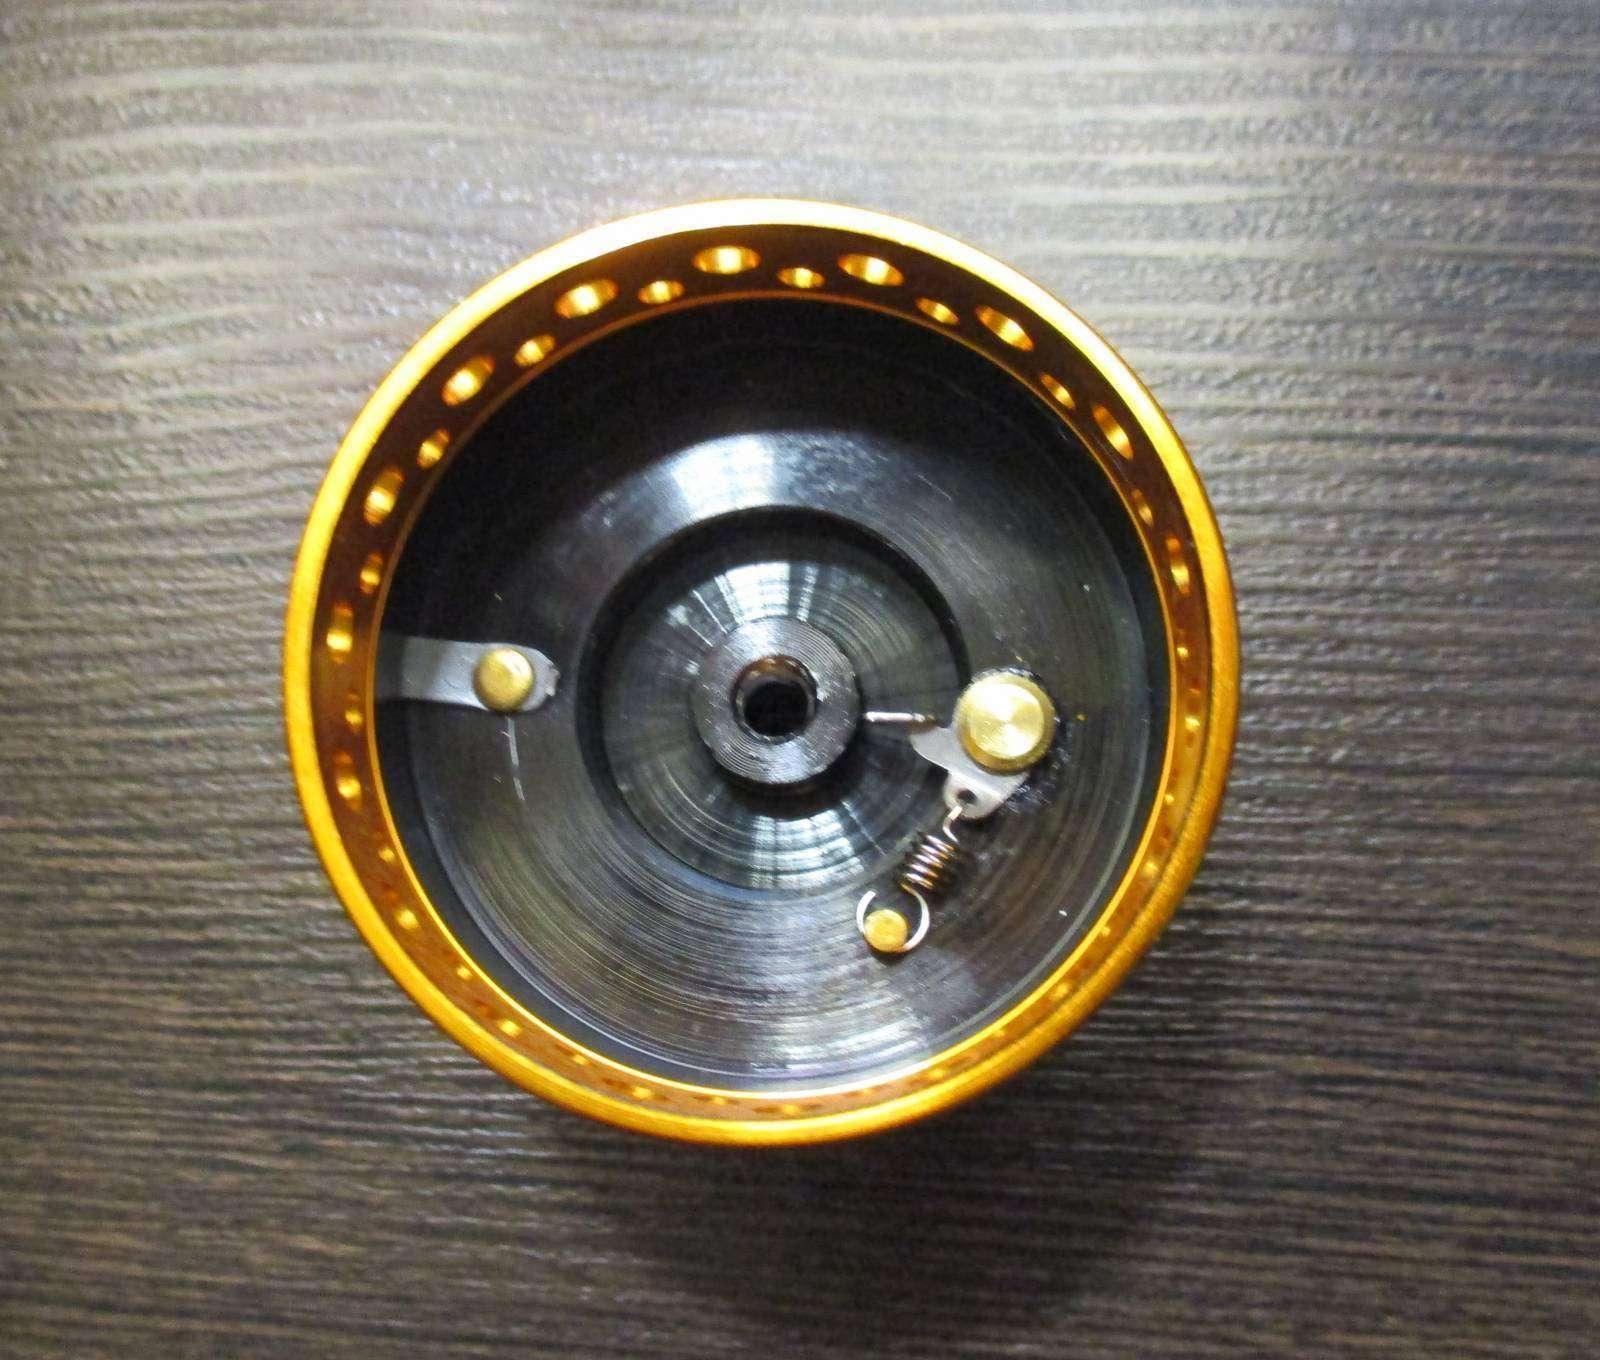 Banggood: Обзор безынерционной спининговой катушки Seaknight windrunner WR 3000.